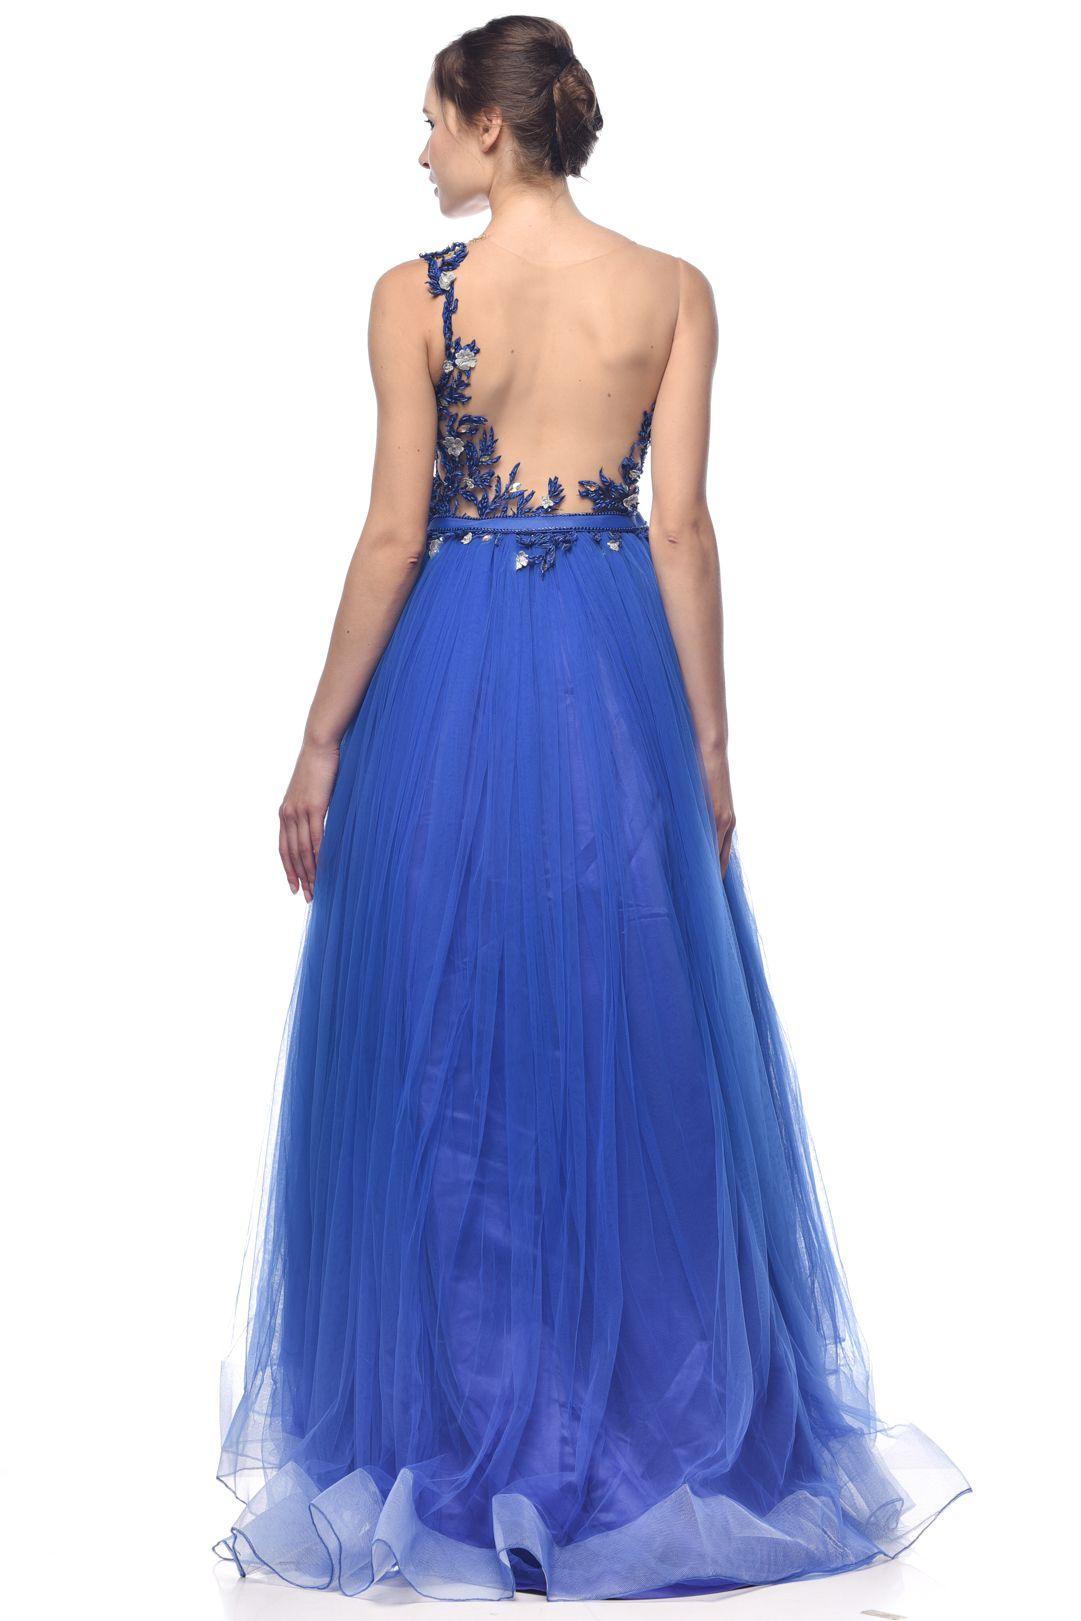 Fancy Enchanting Dress